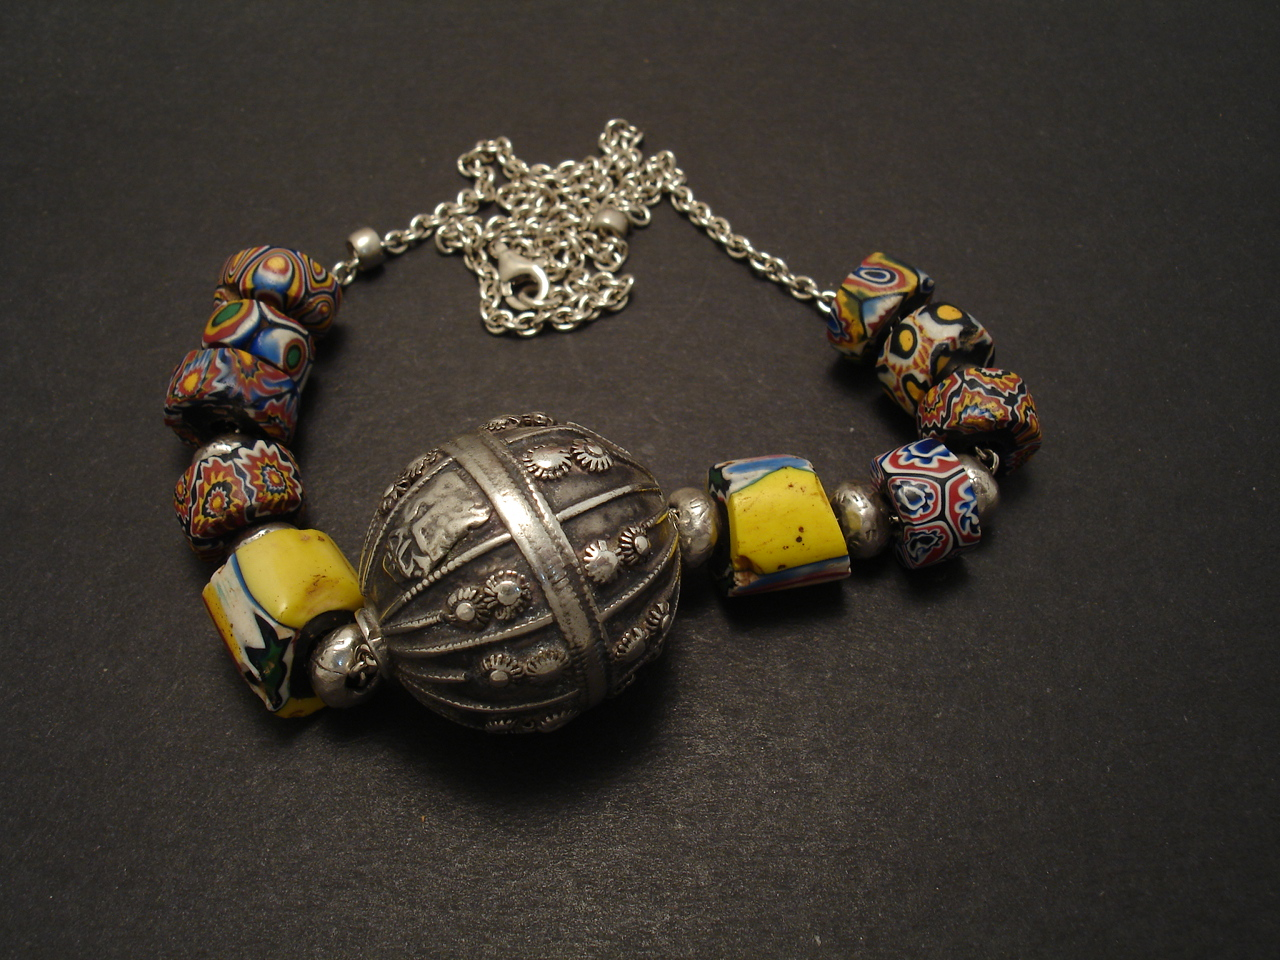 Yemen Silver & Trade Beads Necklace - Christopher William Sydney ...